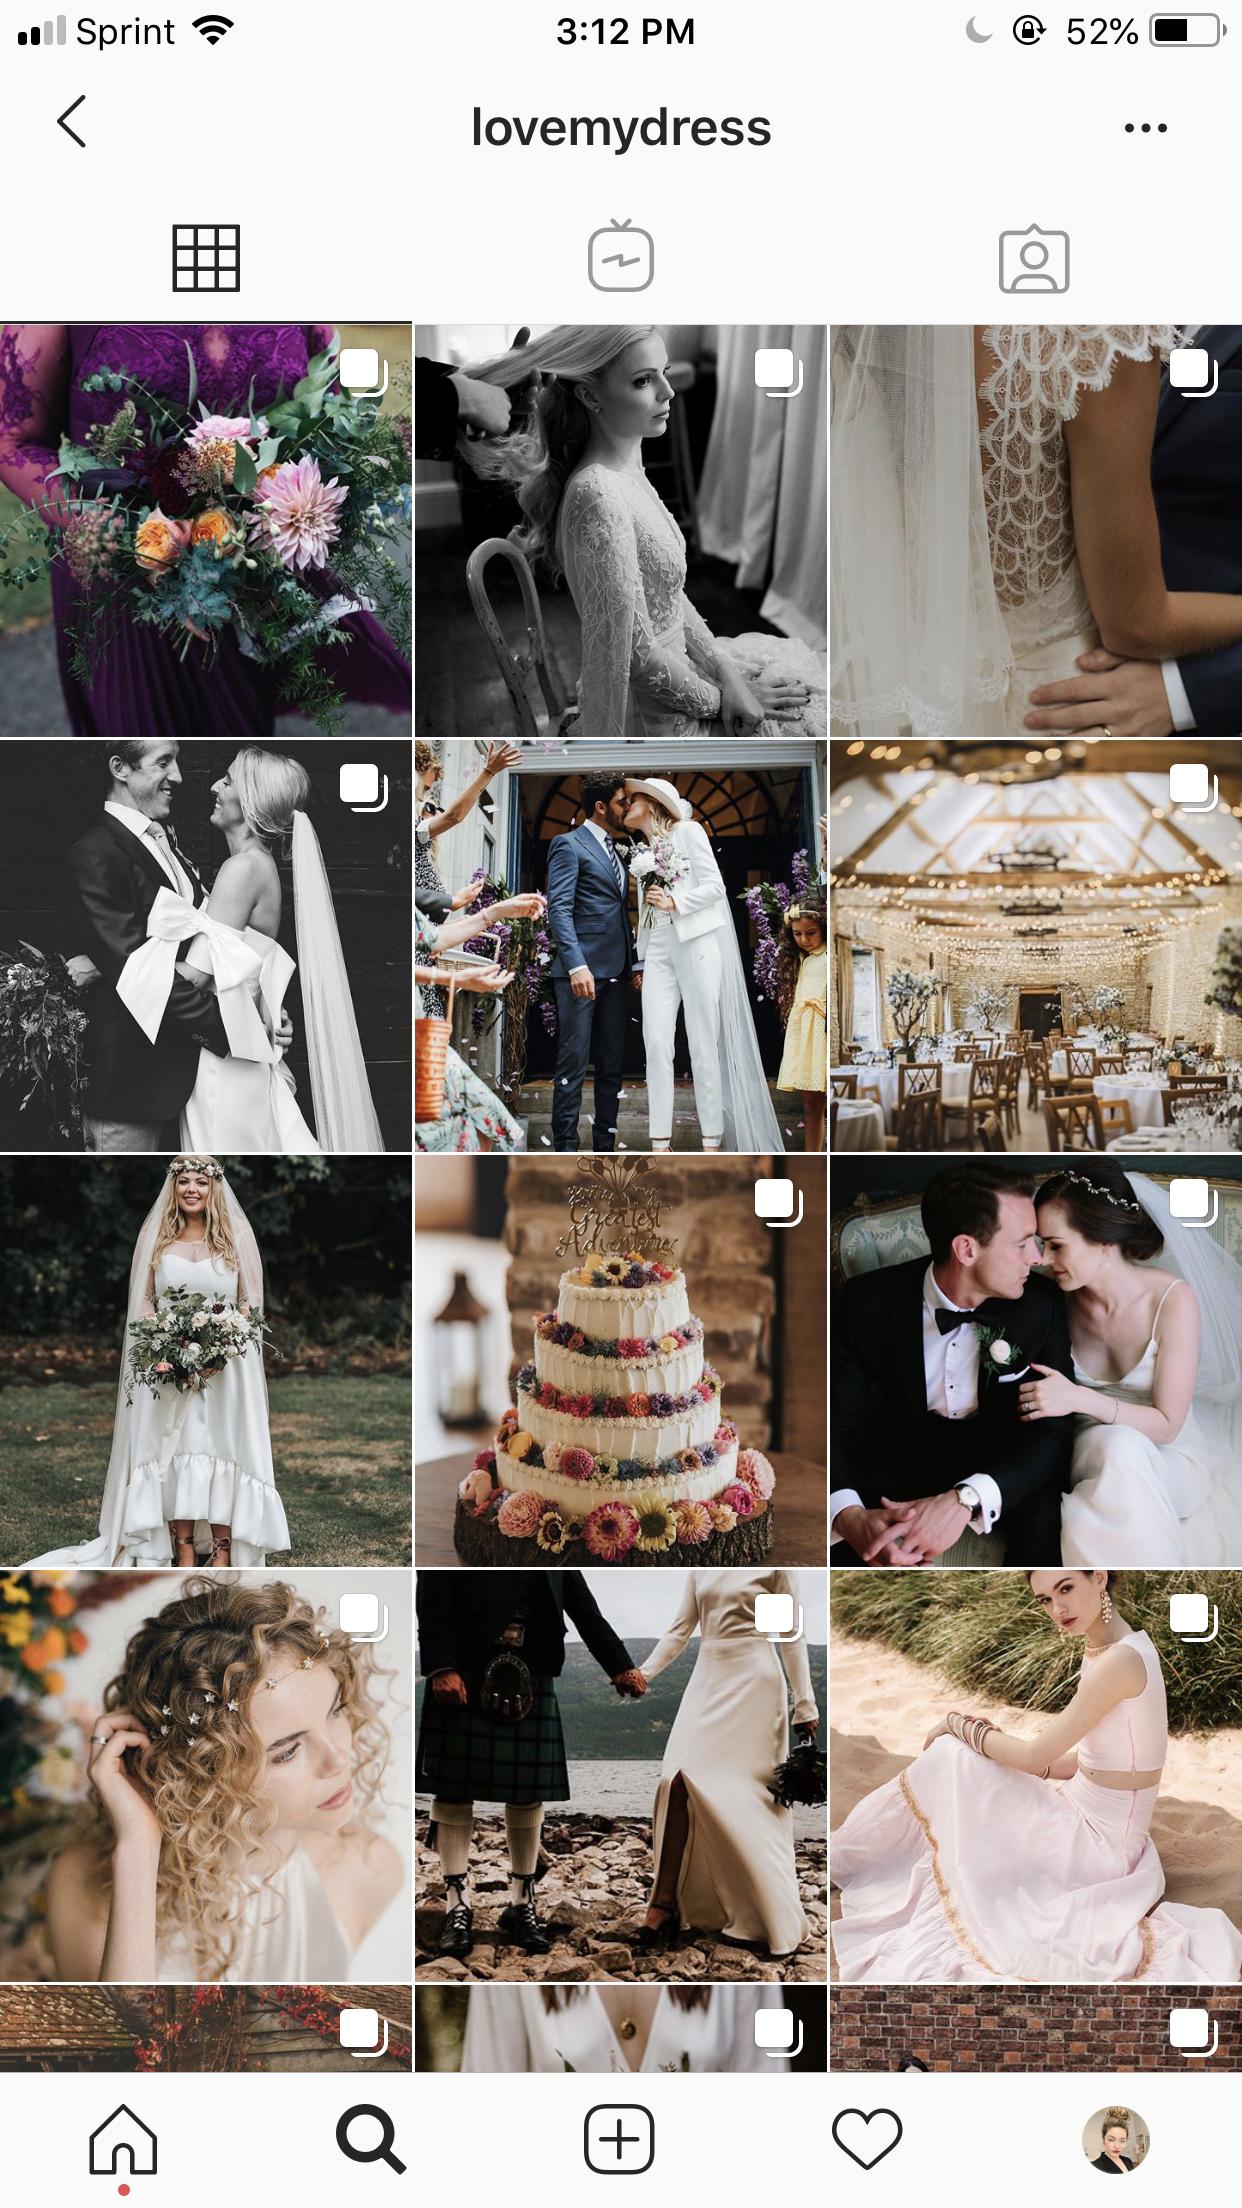 Love my dress wedding blog wedding accounts you need to follow